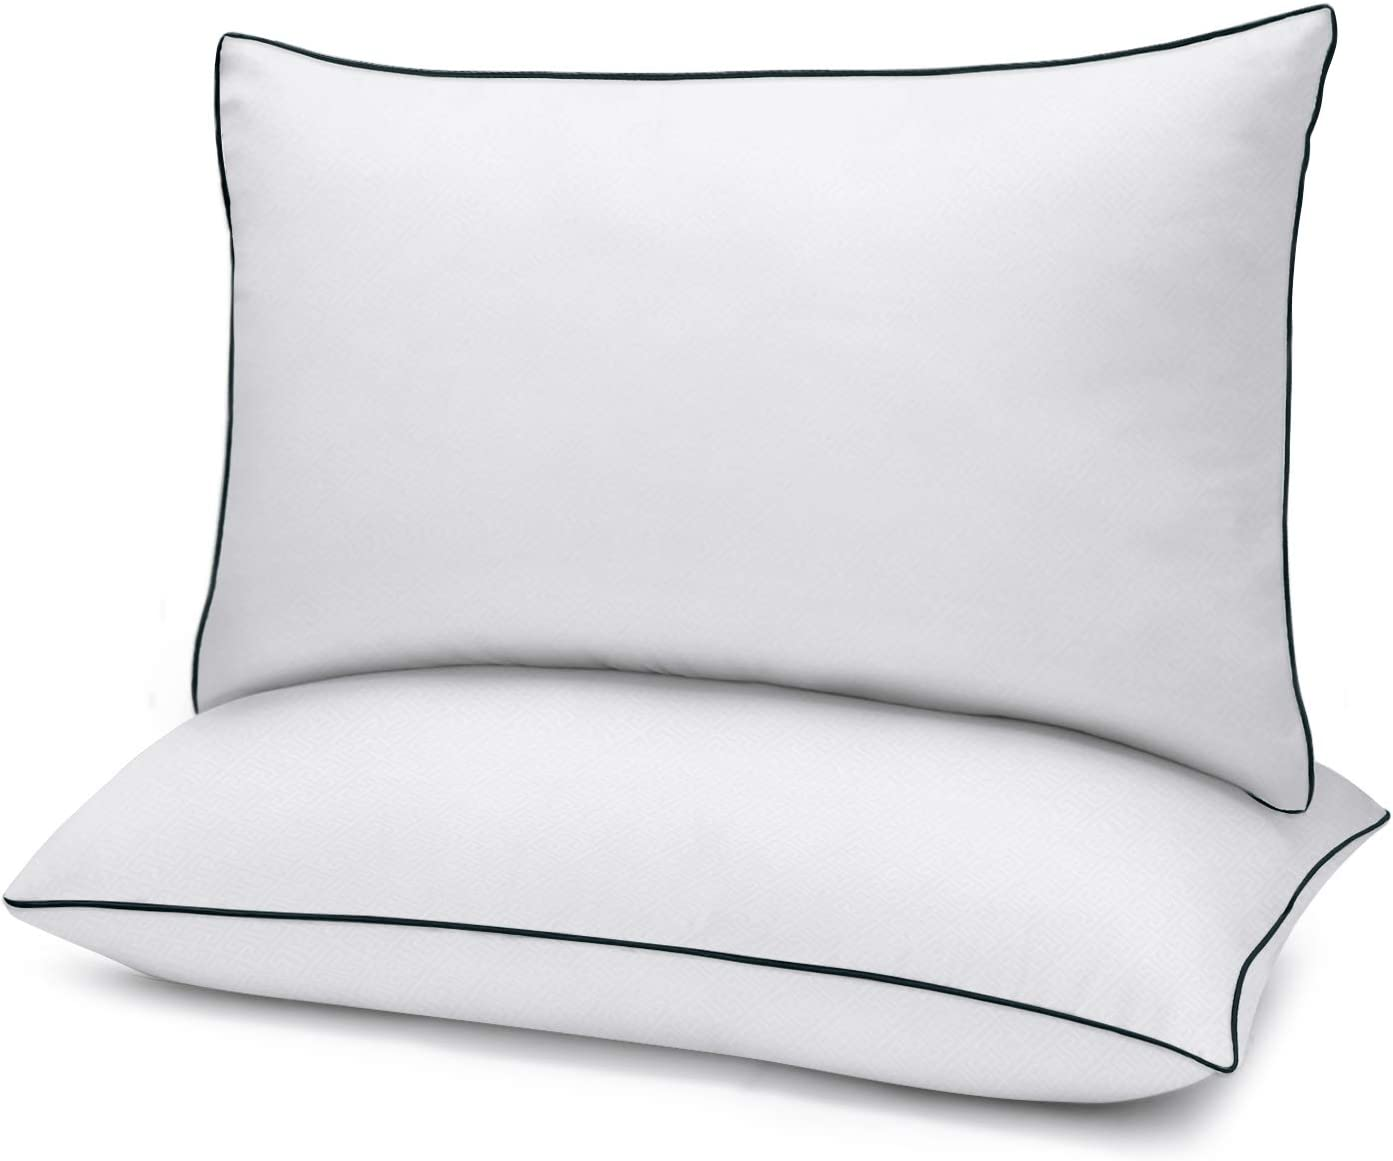 2-Pack Queen Size Bed Pillows for Sleeping Mid Loft Soft Fiber Fill 20x30